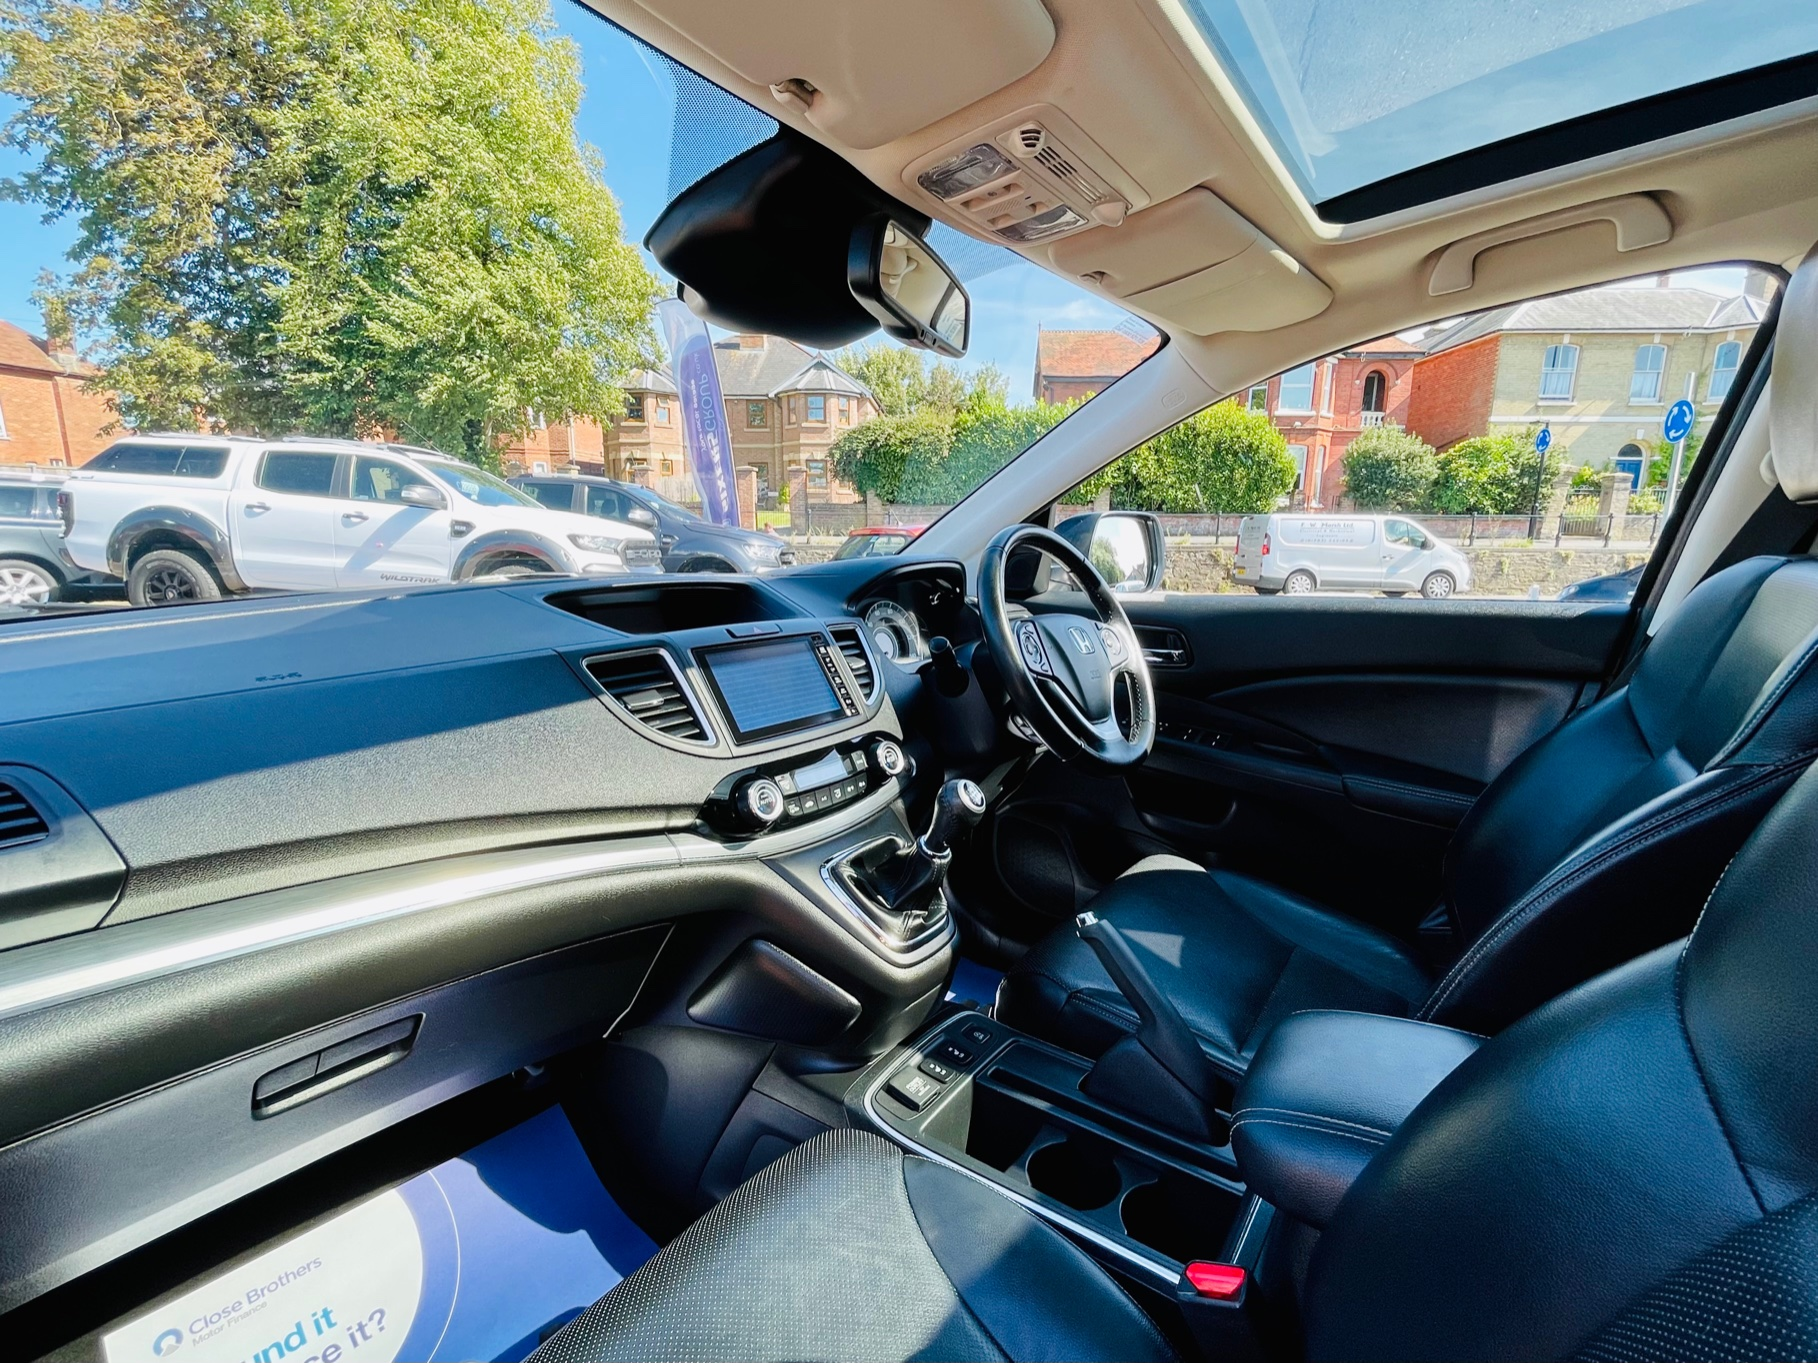 Car For Sale Honda CRV - FX66BUU Sixers Group Image #6